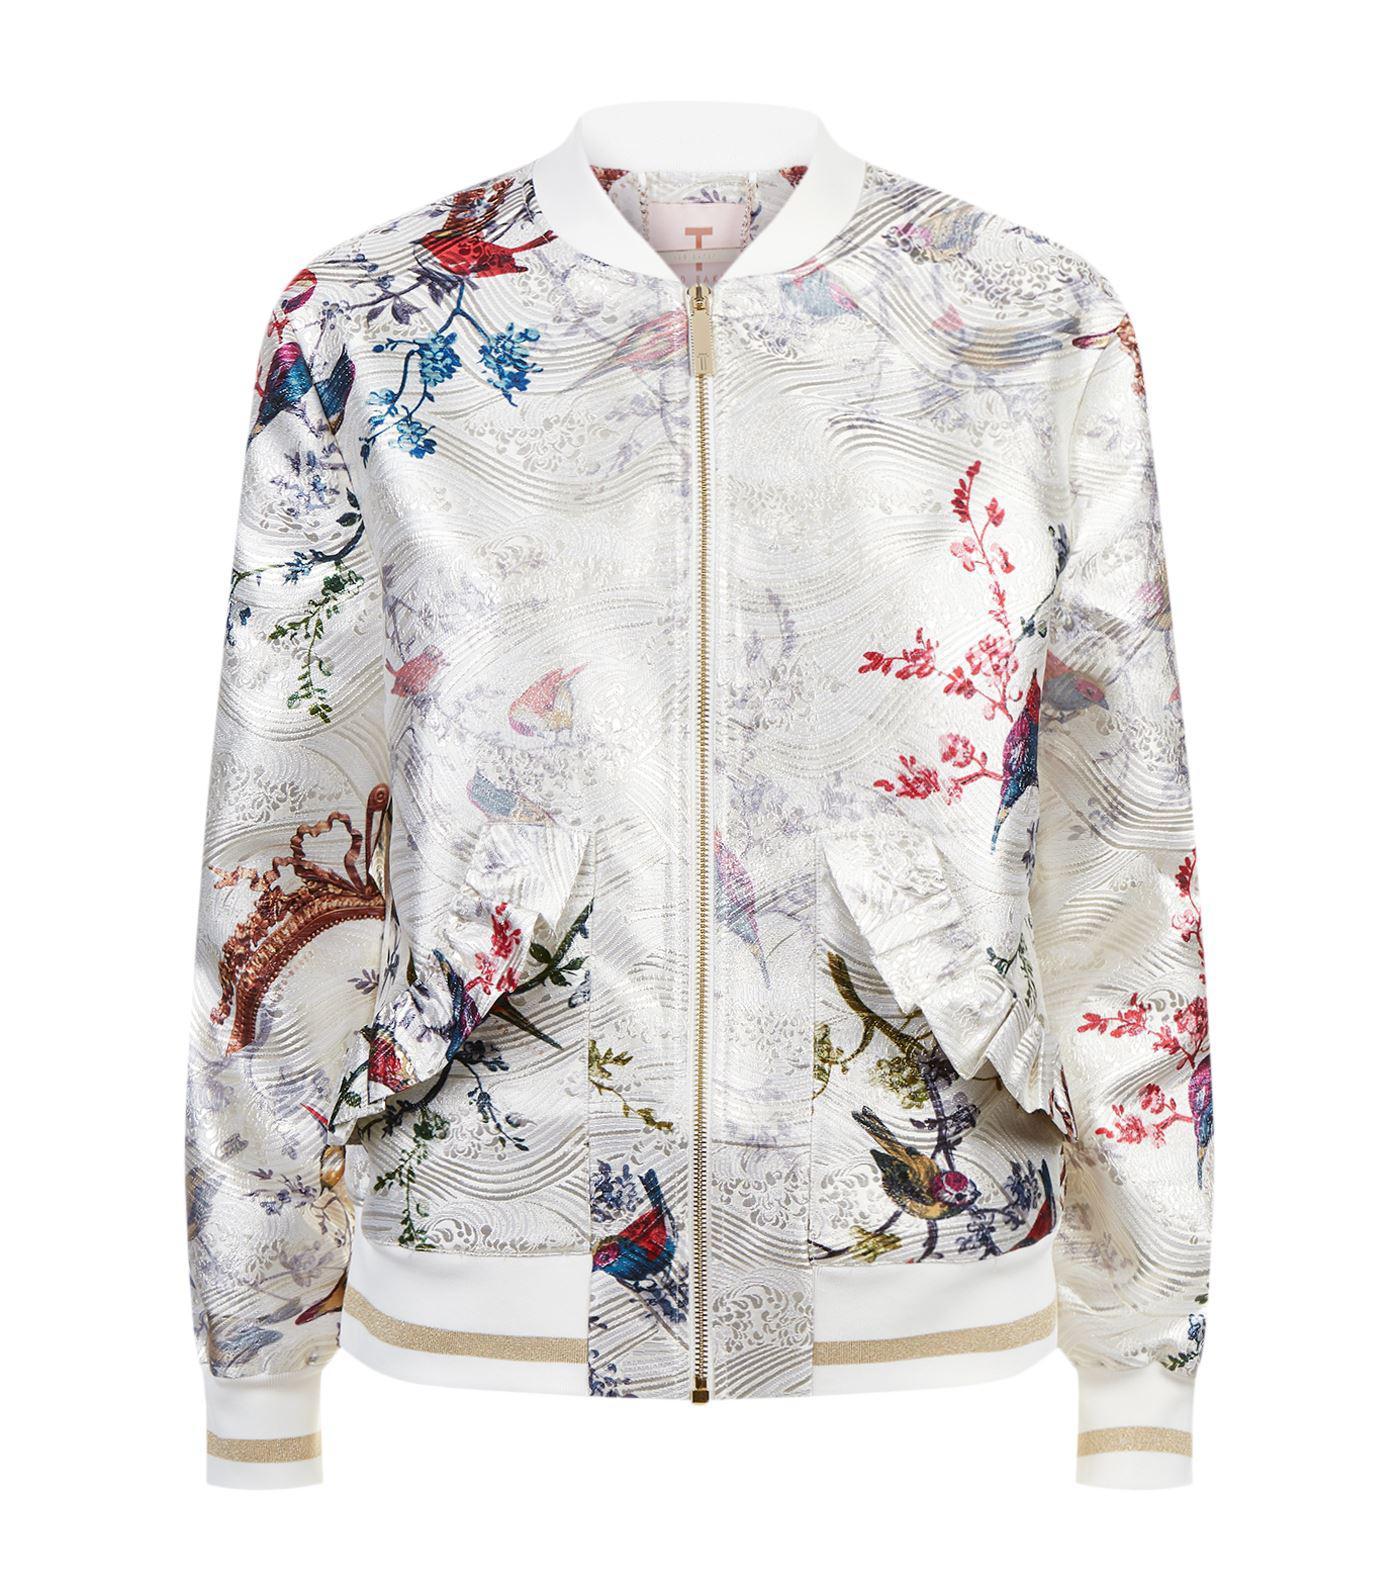 bf1cbb9f2 Lyst - Ted Baker Tanzi Floral Bomber Jacket